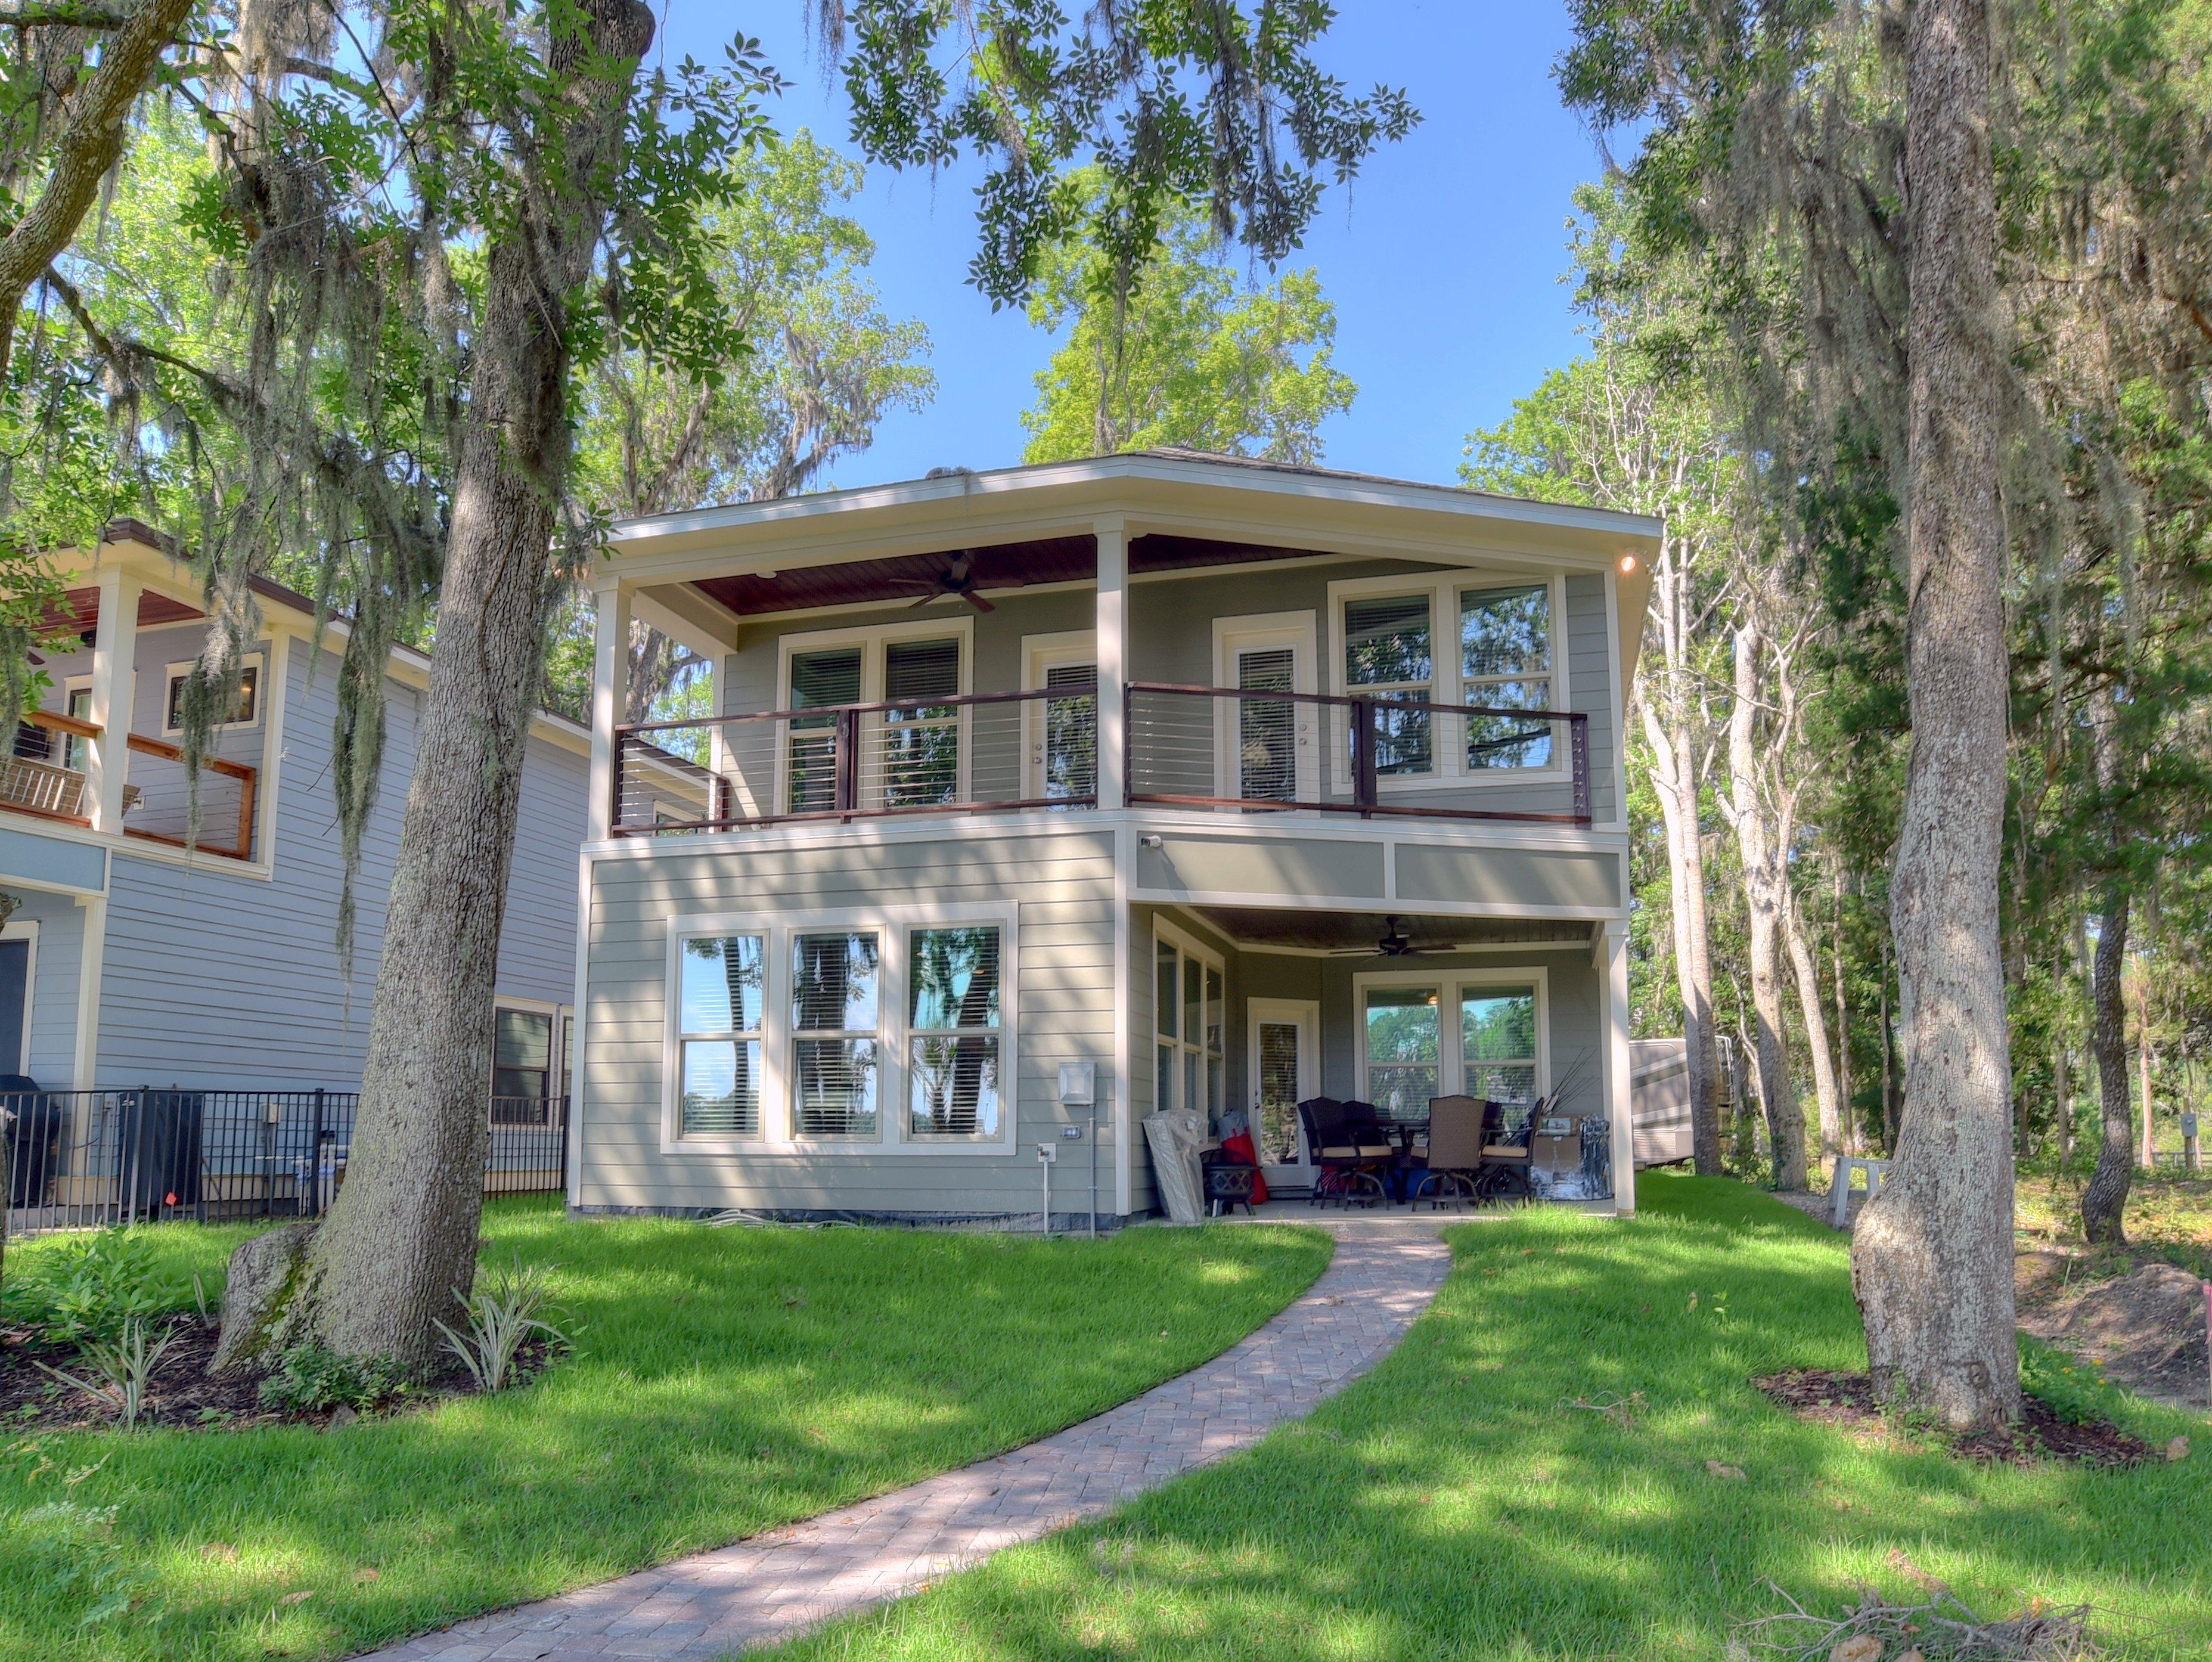 93 Beacon Point Condo rental in Sandestin Rentals ~ Cottages and Villas  in Destin Florida - #4